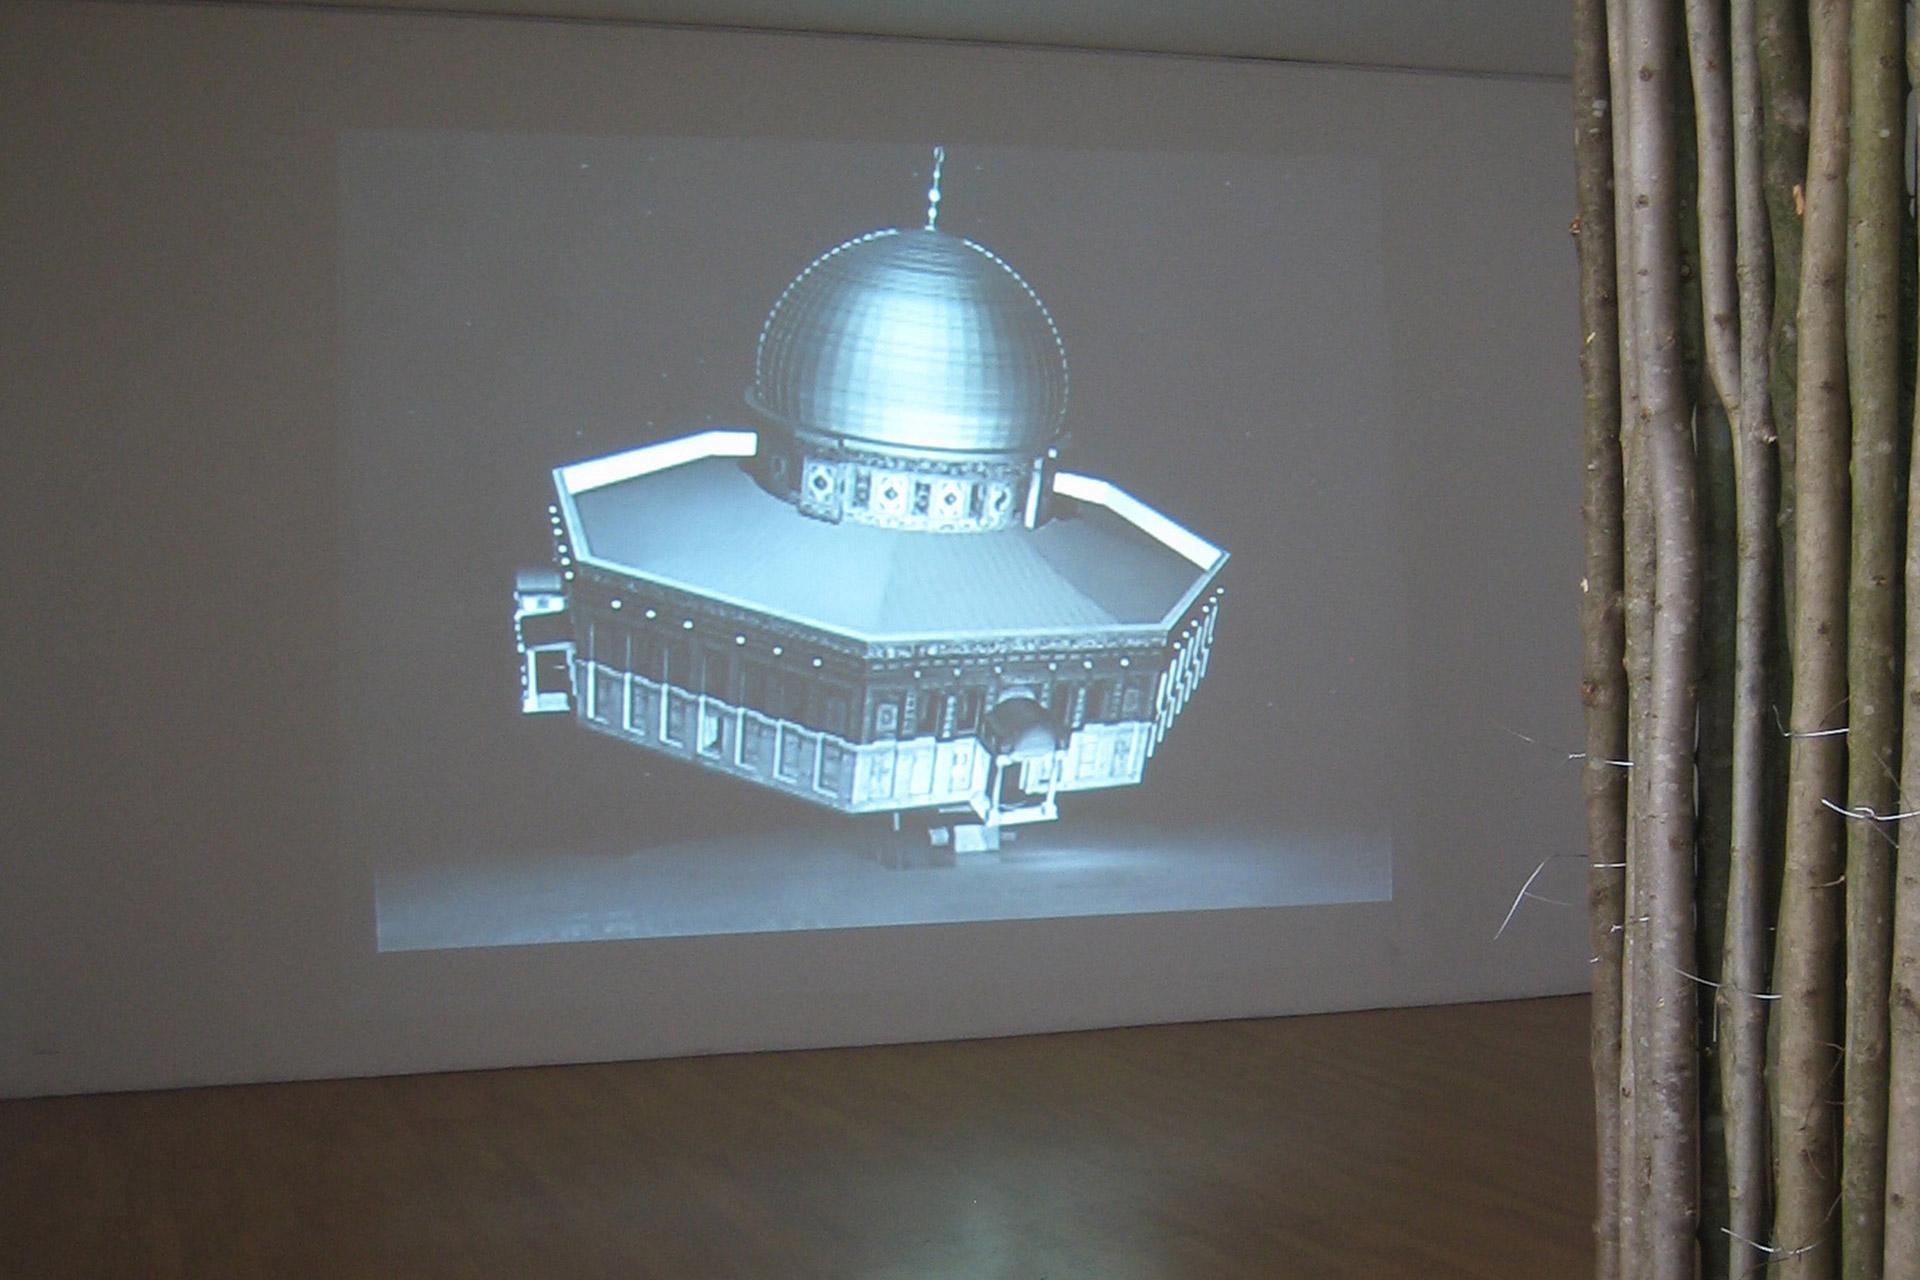 Wael-Shawky-Kunsthalle-Winterthur-2007-3.jpg